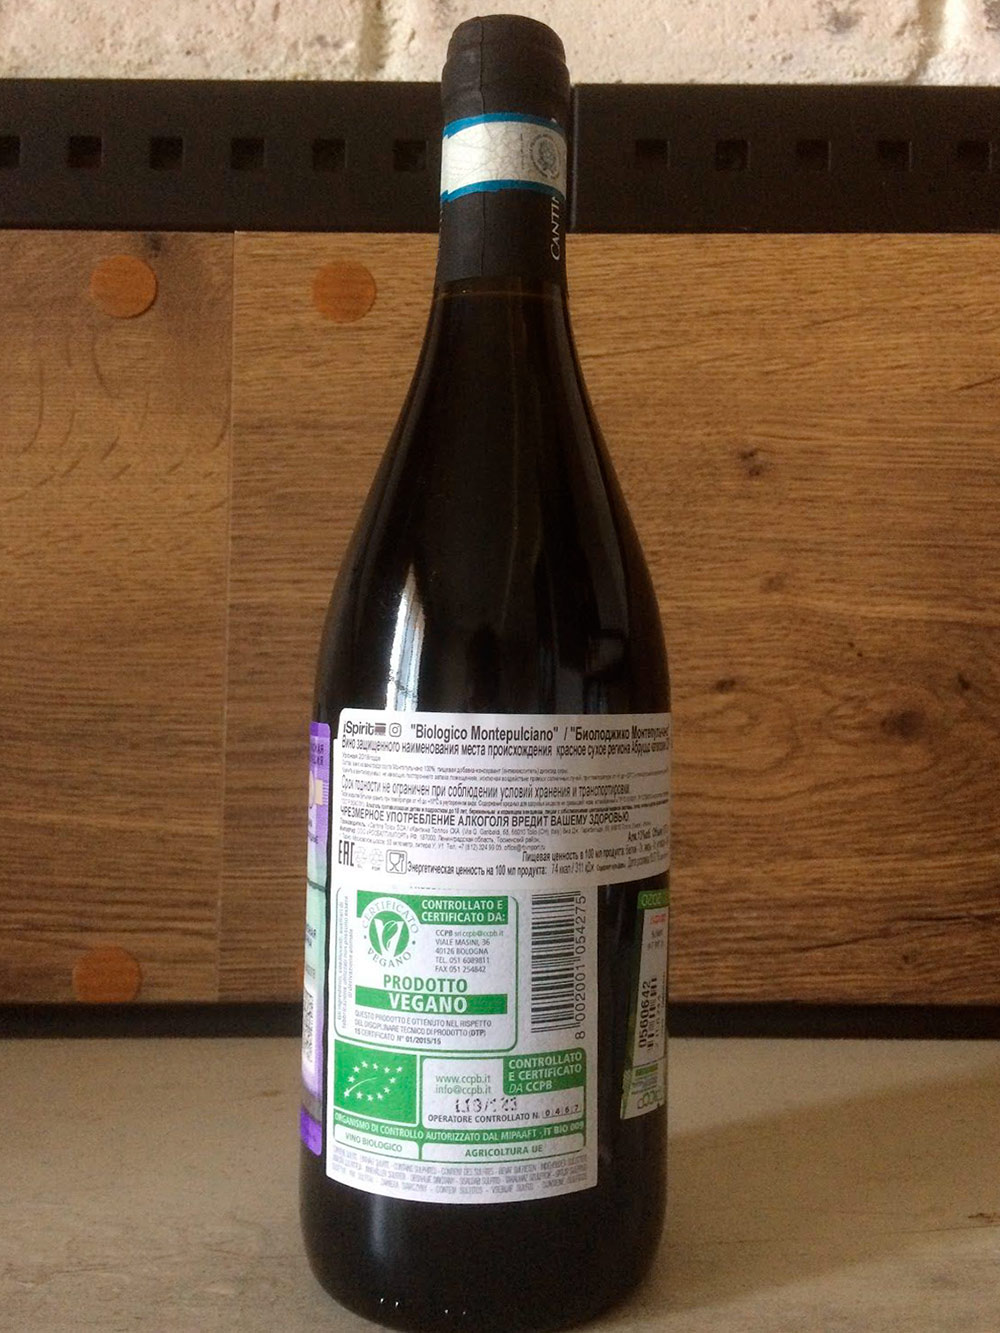 Сертифицированное веганское вино за 1591<span class=ruble>Р</span>. Это Montepulciano d'Abruzzo Biologico от дома Cantina Tollo